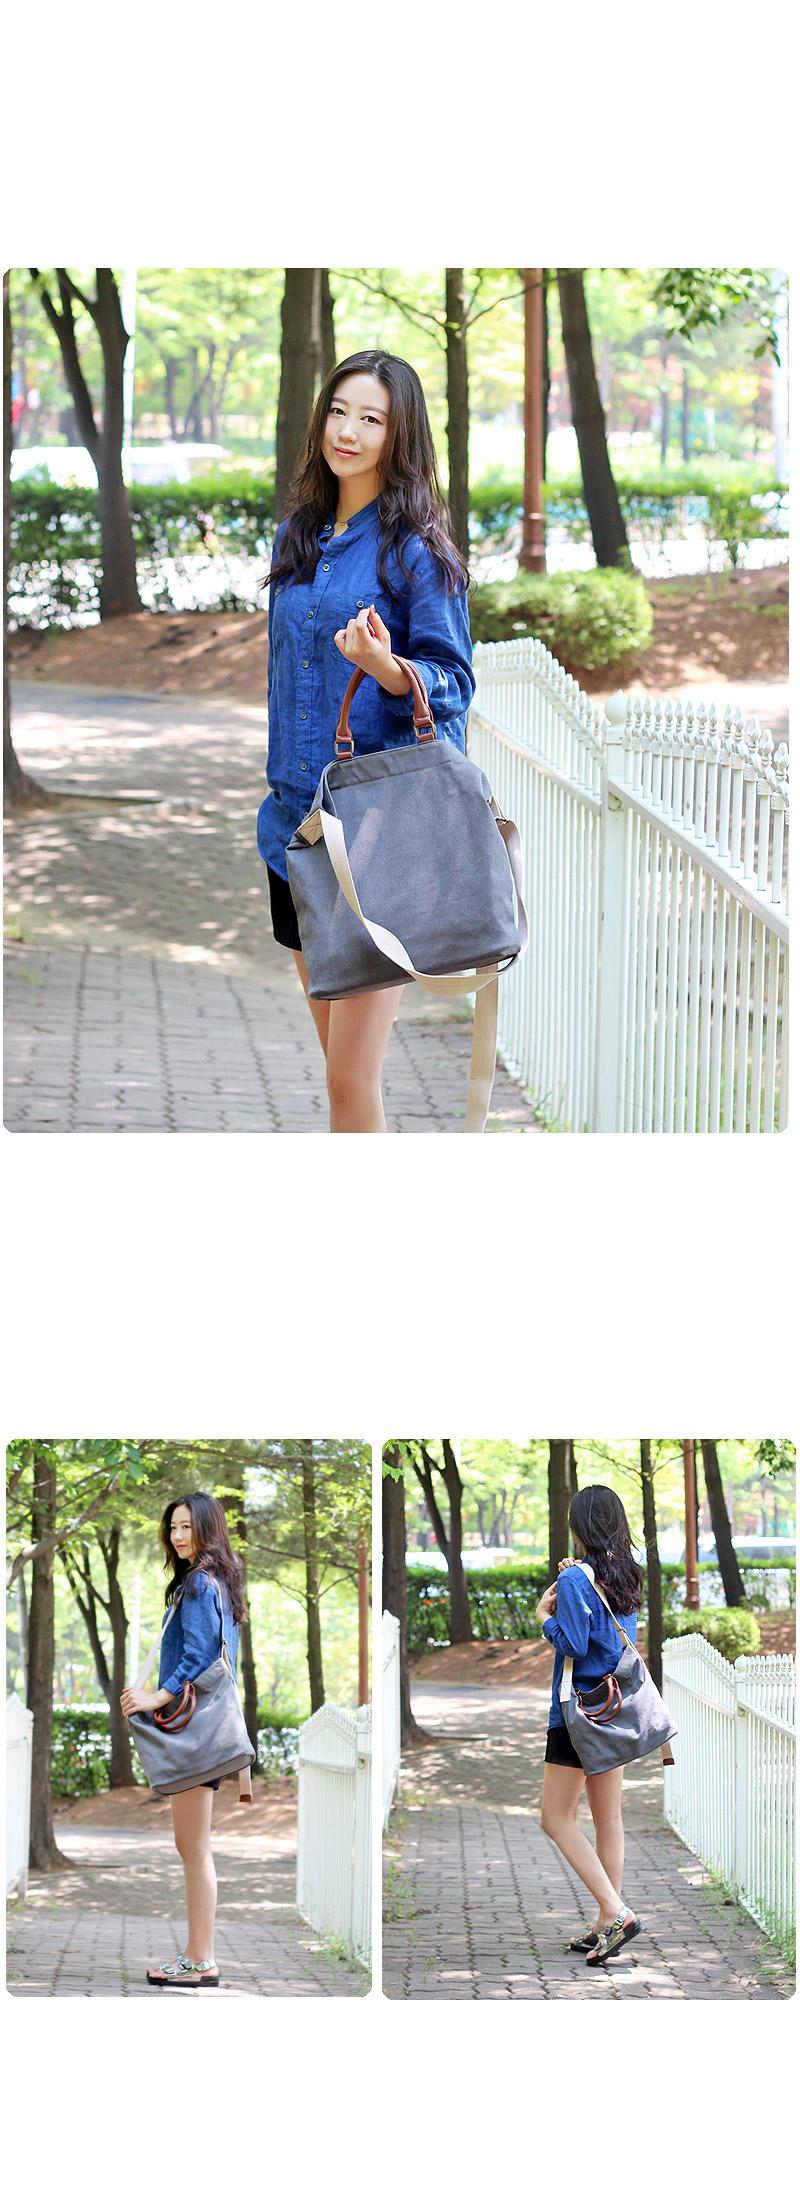 Shoulder&tote bag no.K50211view